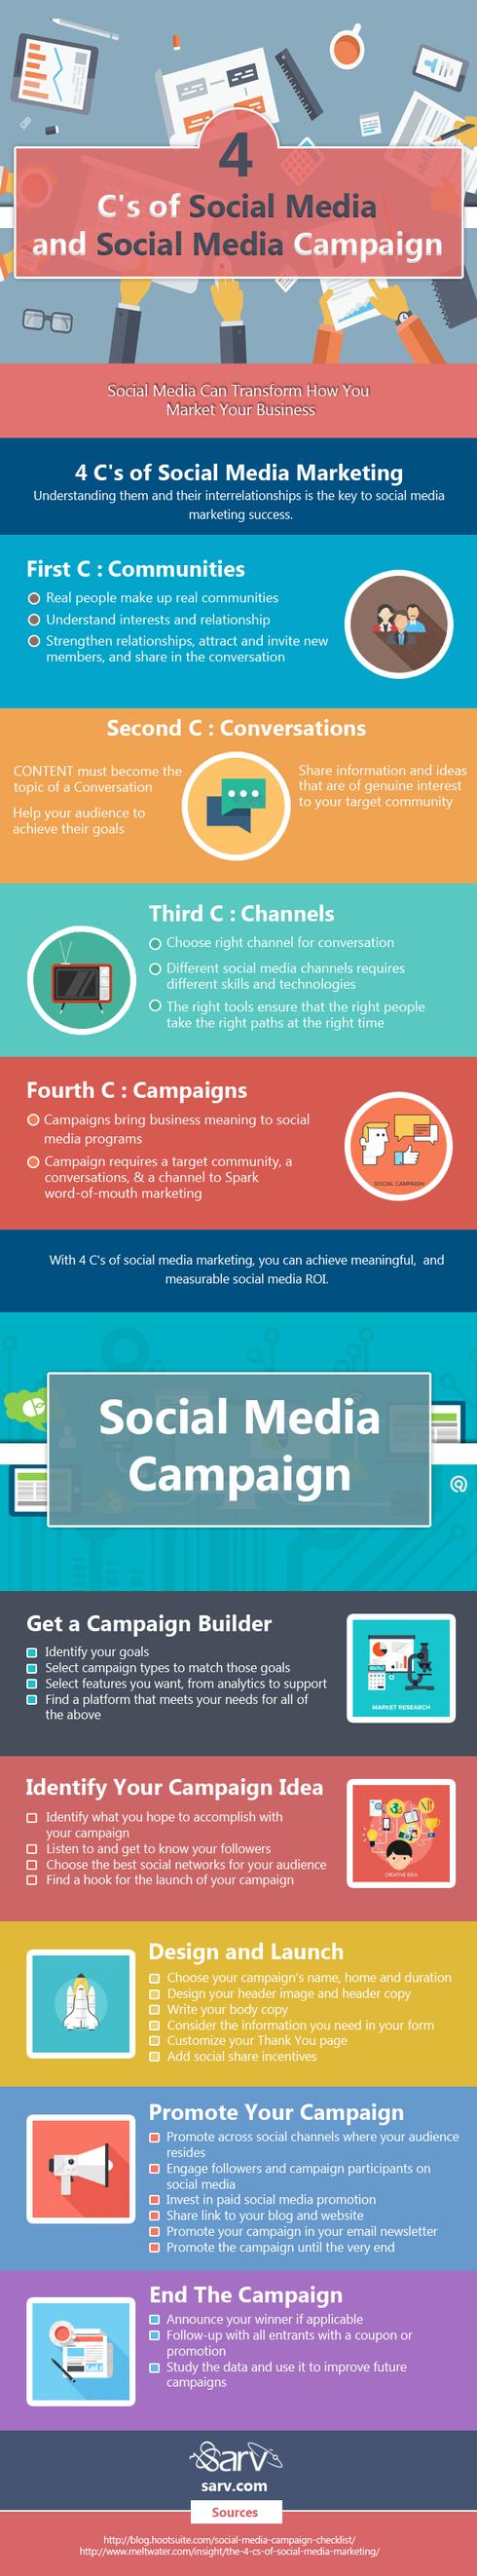 4 C's of Social Media and Social Media Campaign #SocialMedia via Pawan Kumar